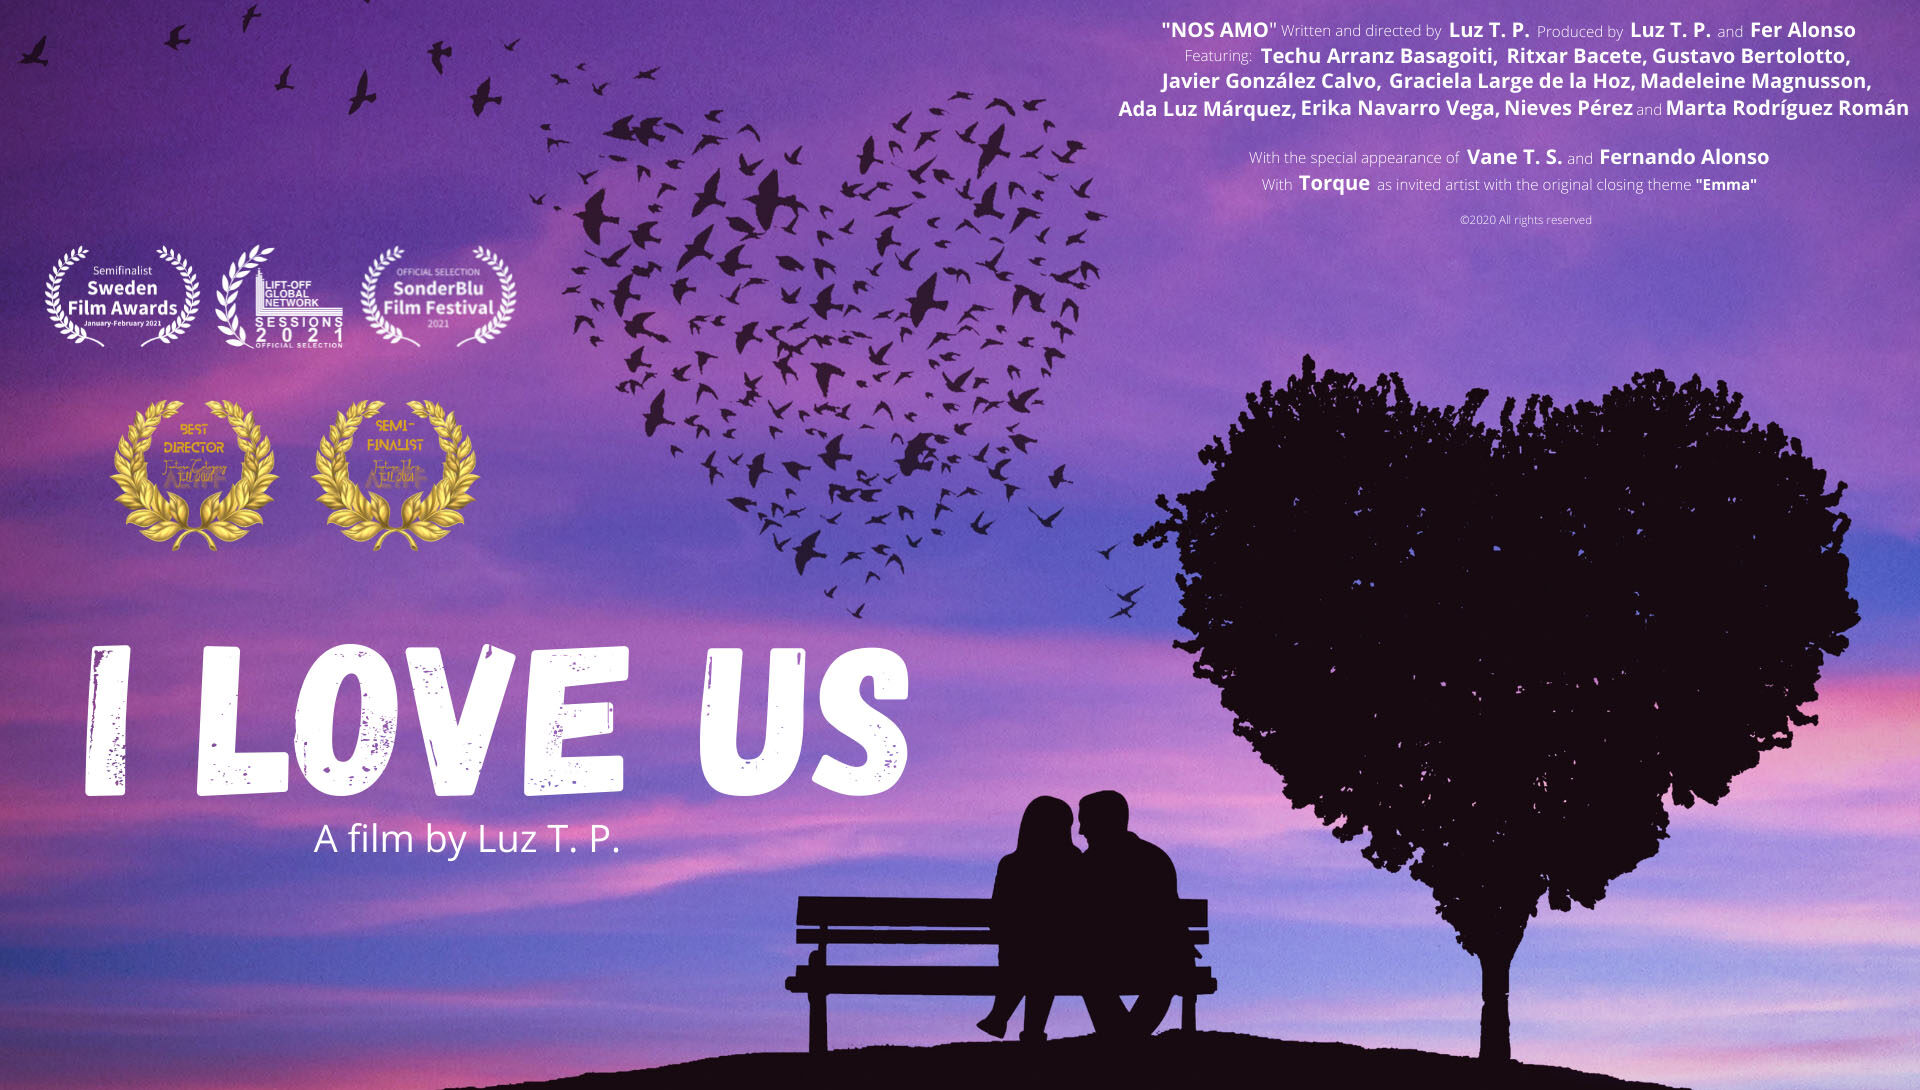 I-Love-Us-Trailer-Poster-Horizontal